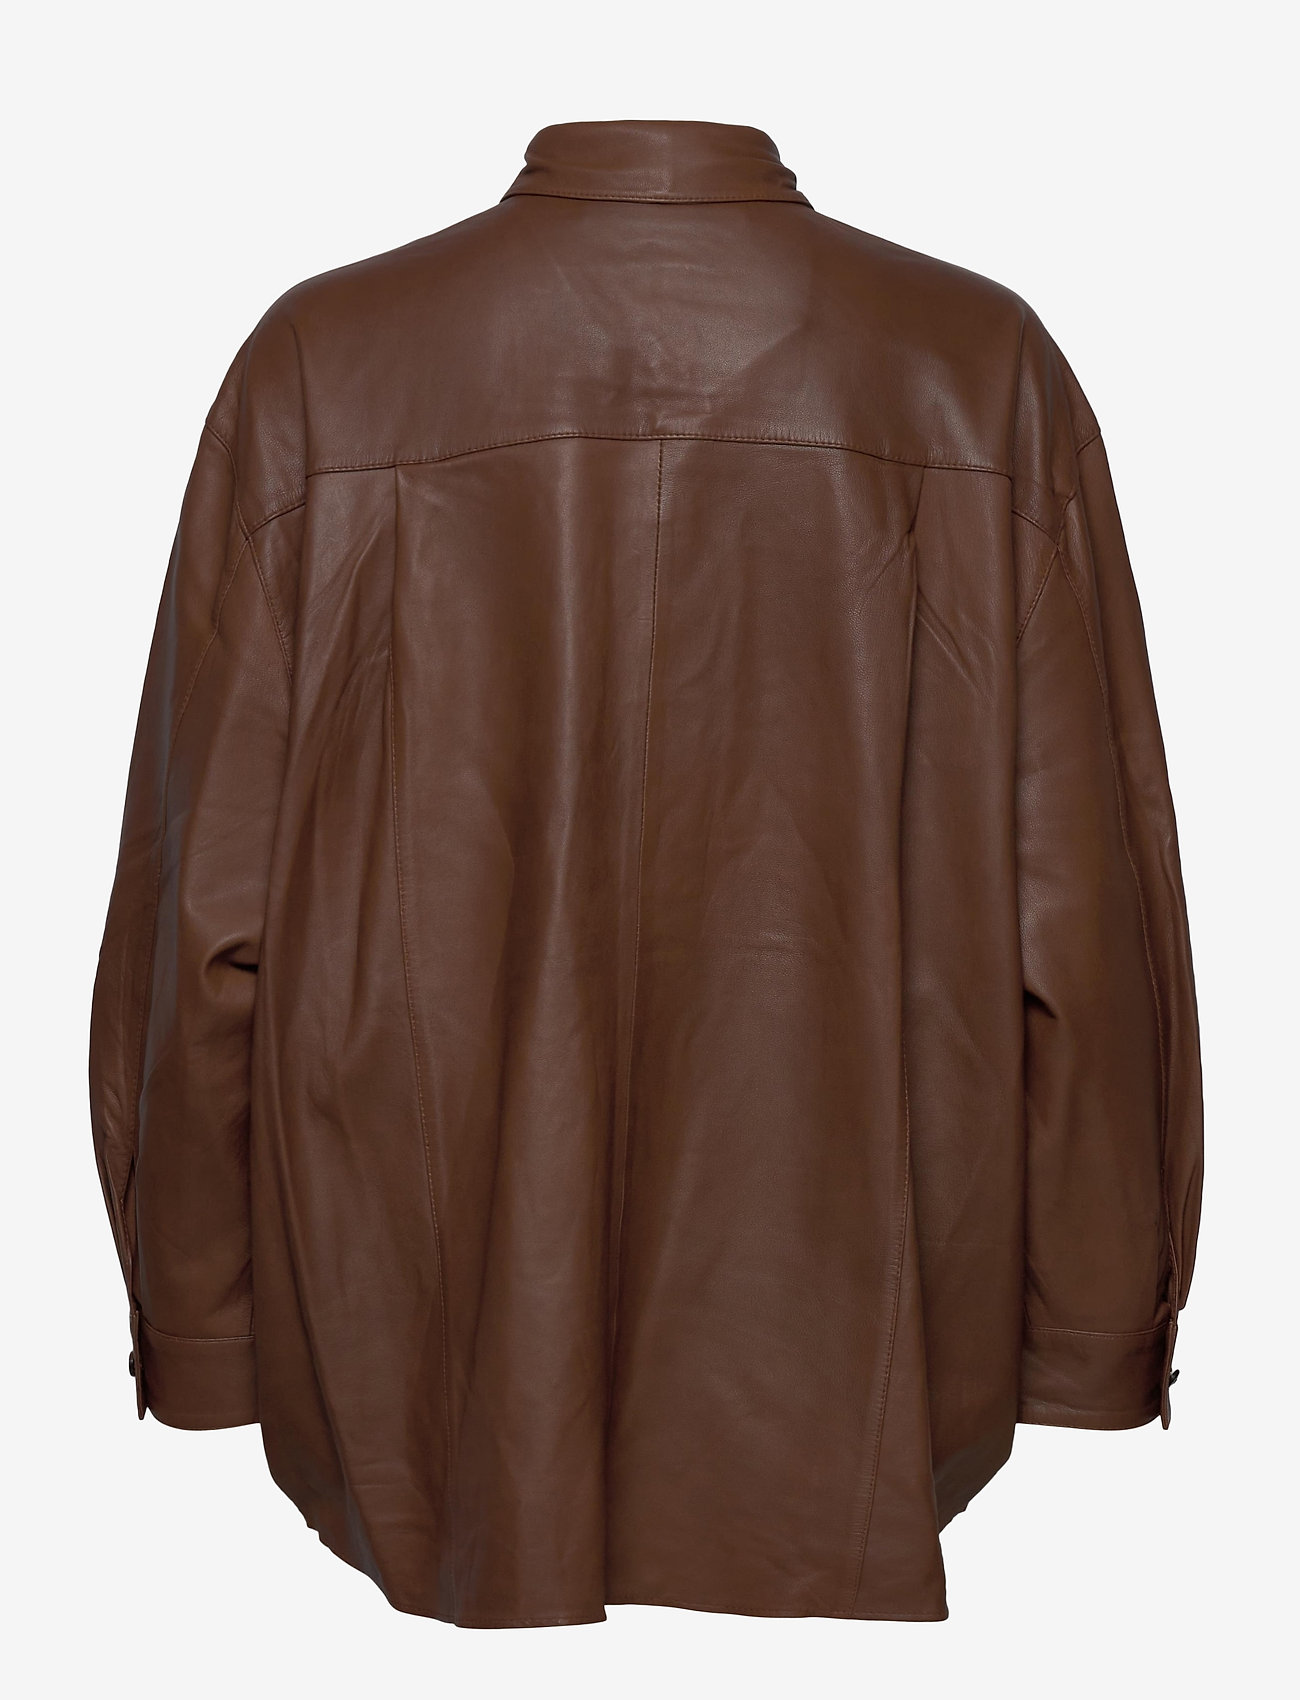 MDK / Munderingskompagniet - Agnes thin leather shirt - overshirts - monks robe - 1